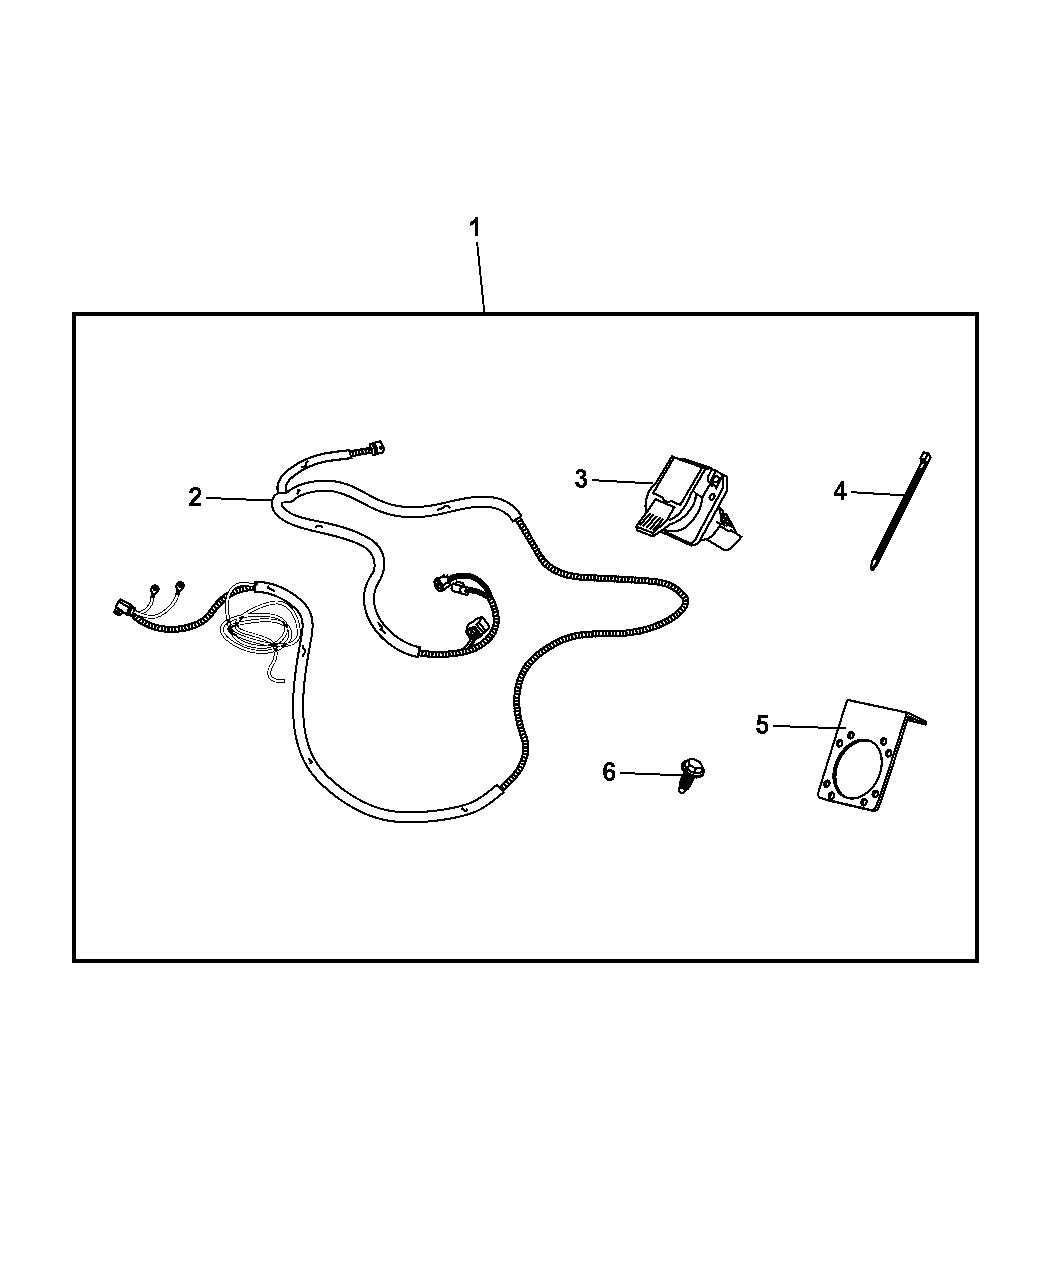 Jeep Wrangler Wiring Kit